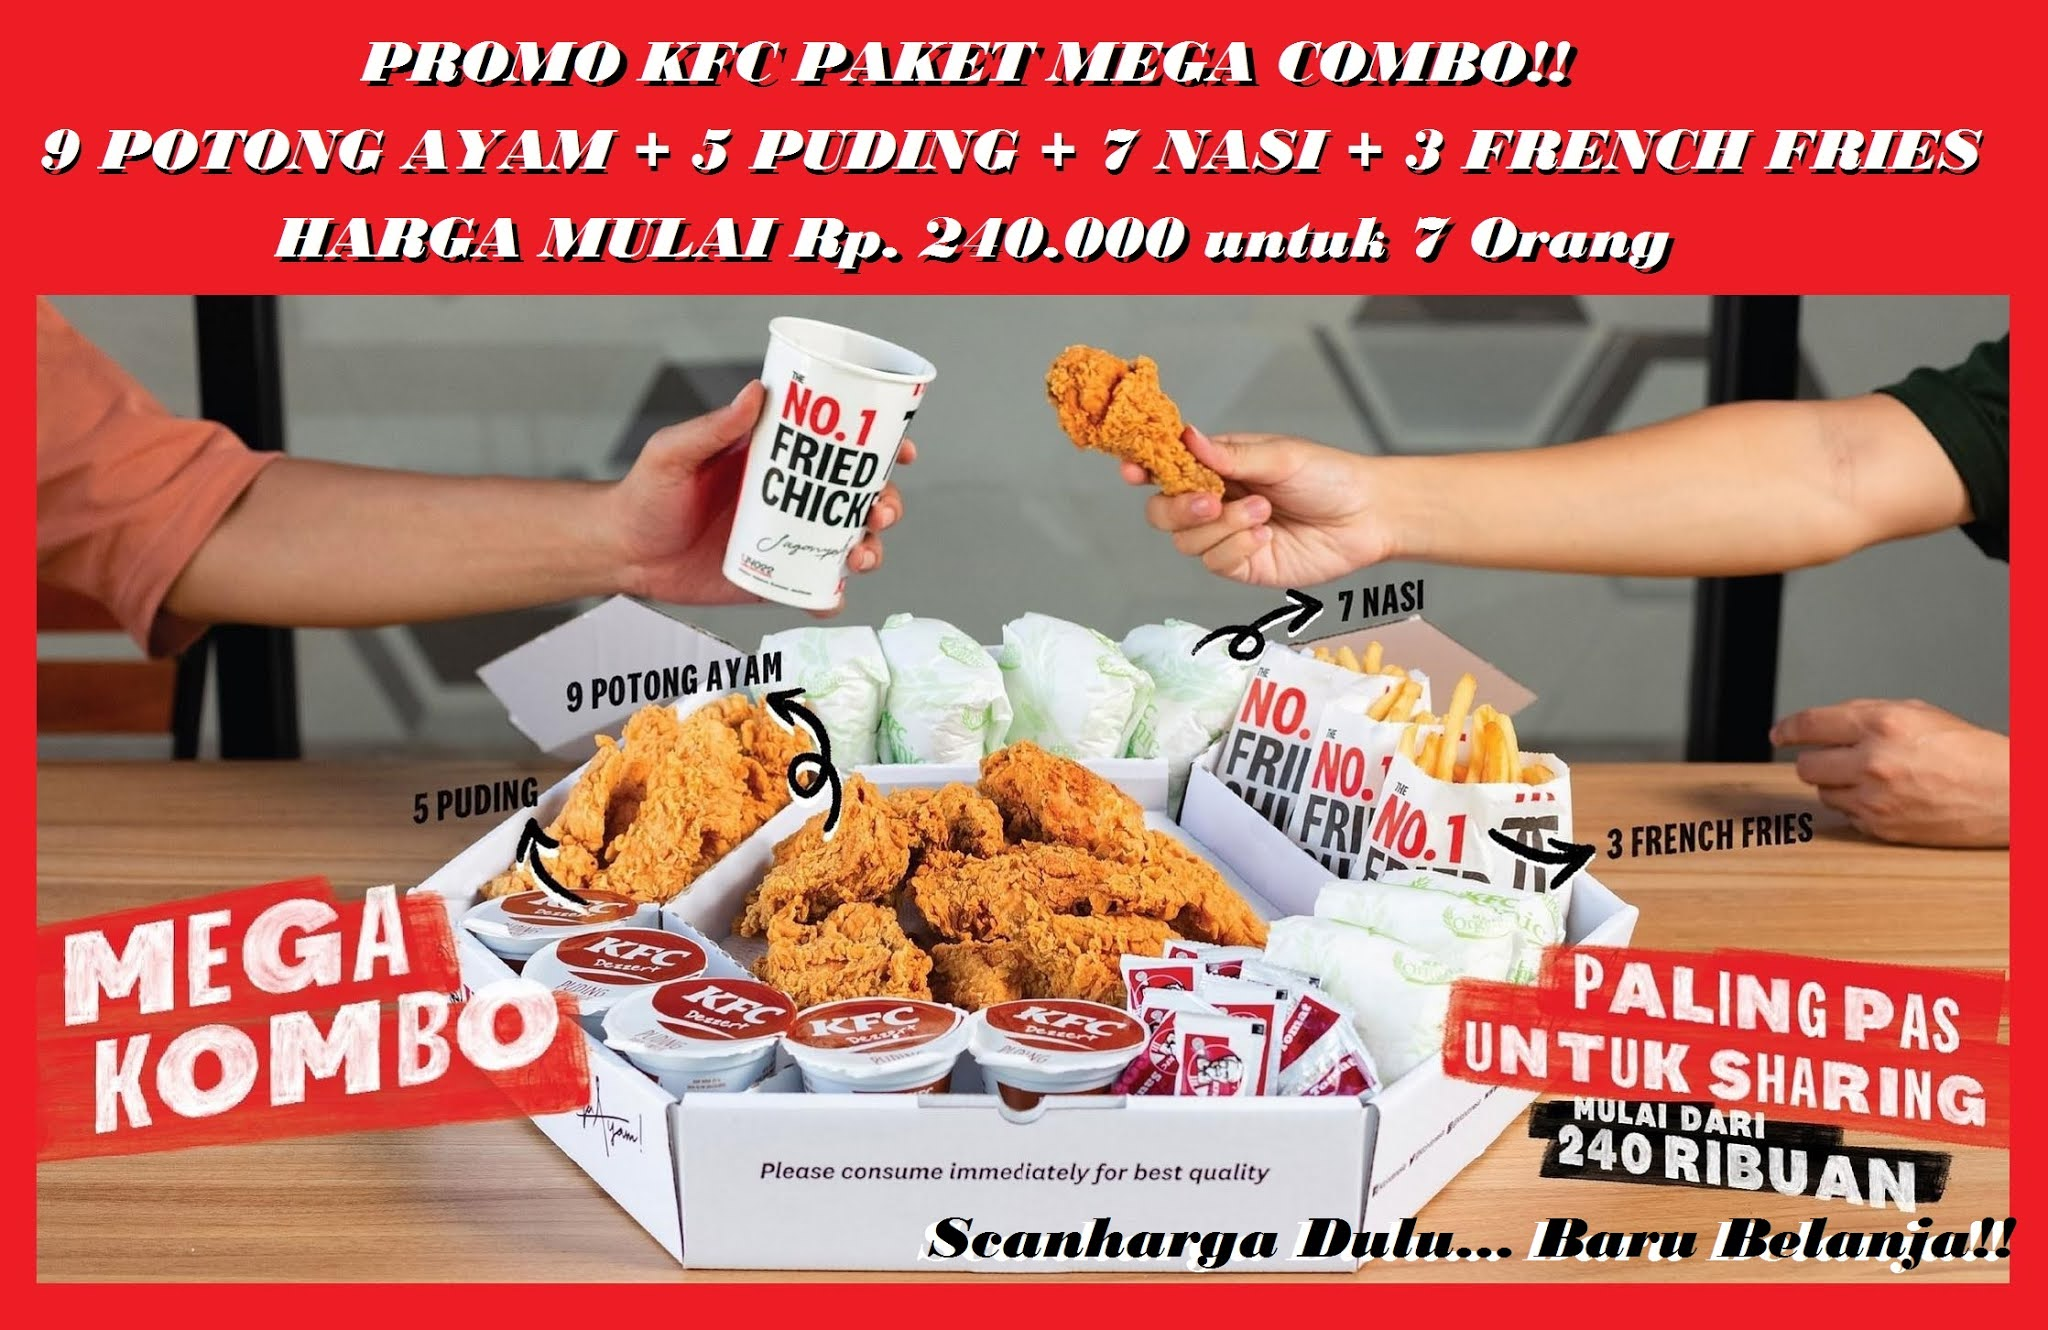 Promo KFC Terbaru Paket MEGA COMBO - Harga mulai Rp 200 Ribuan